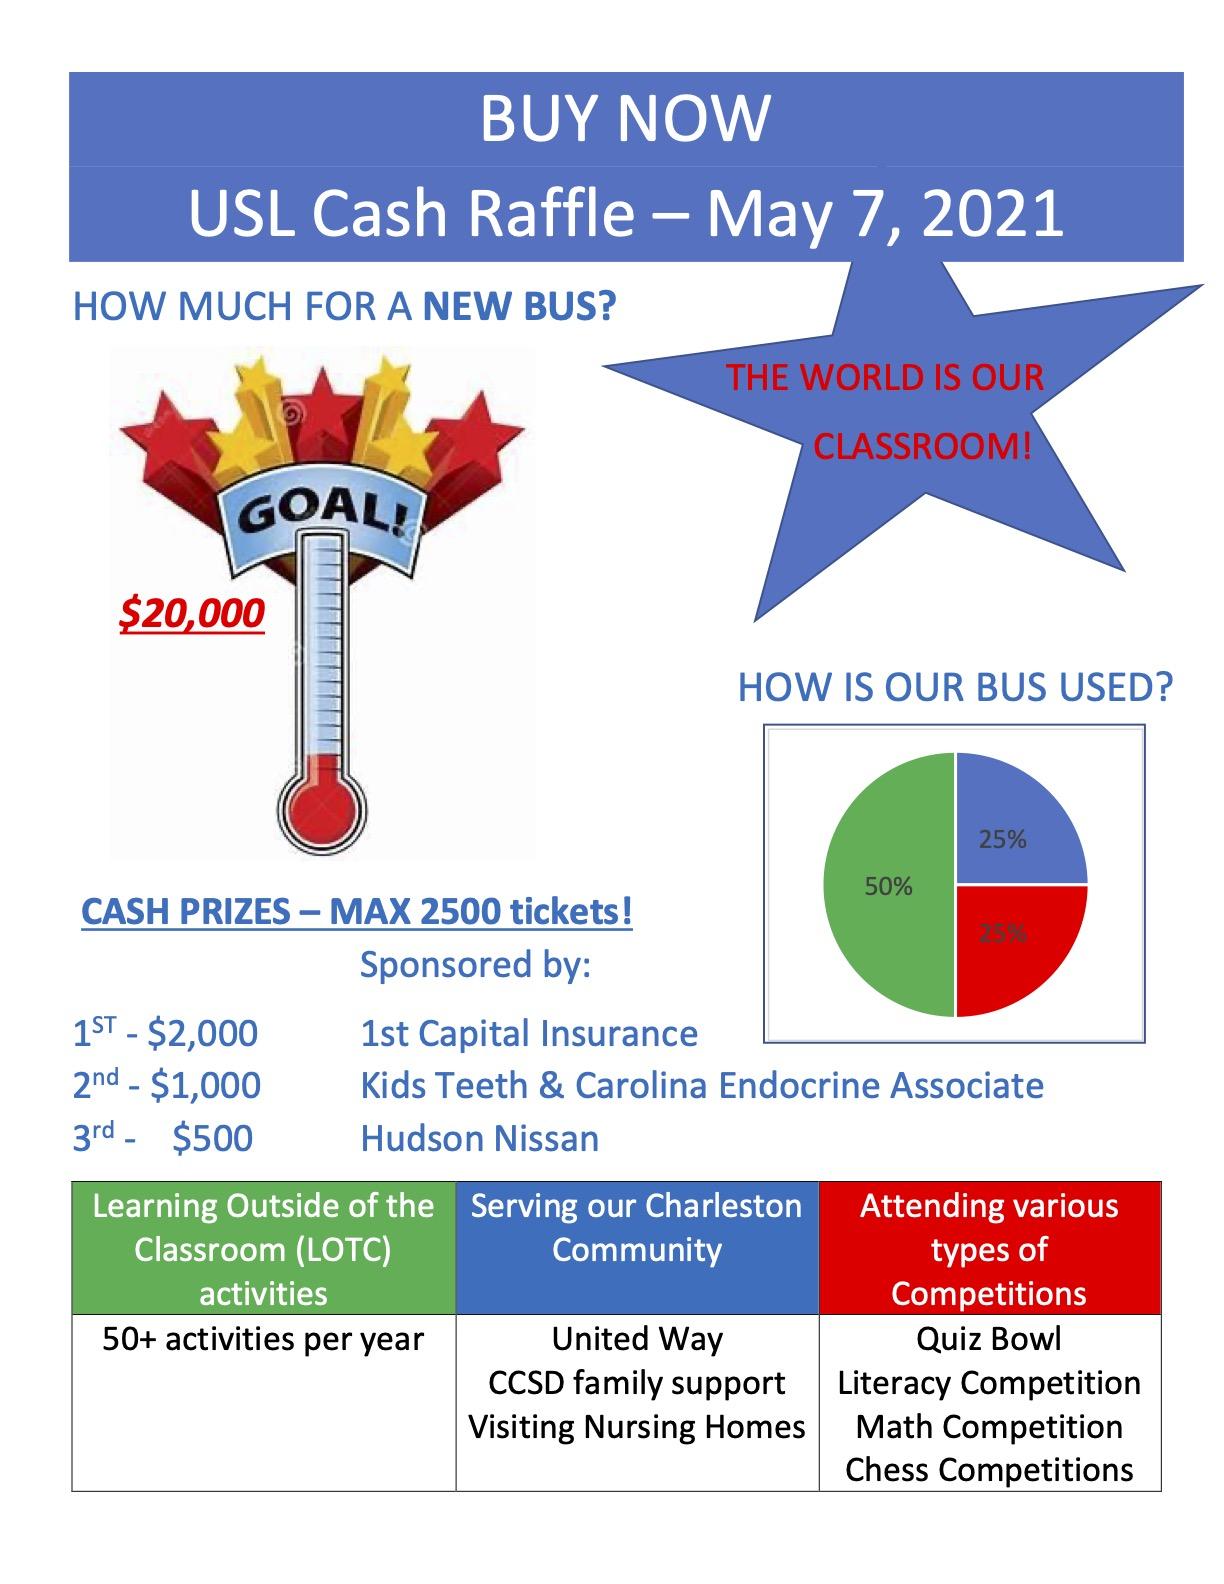 USL Cash Raffle Fundraising ART